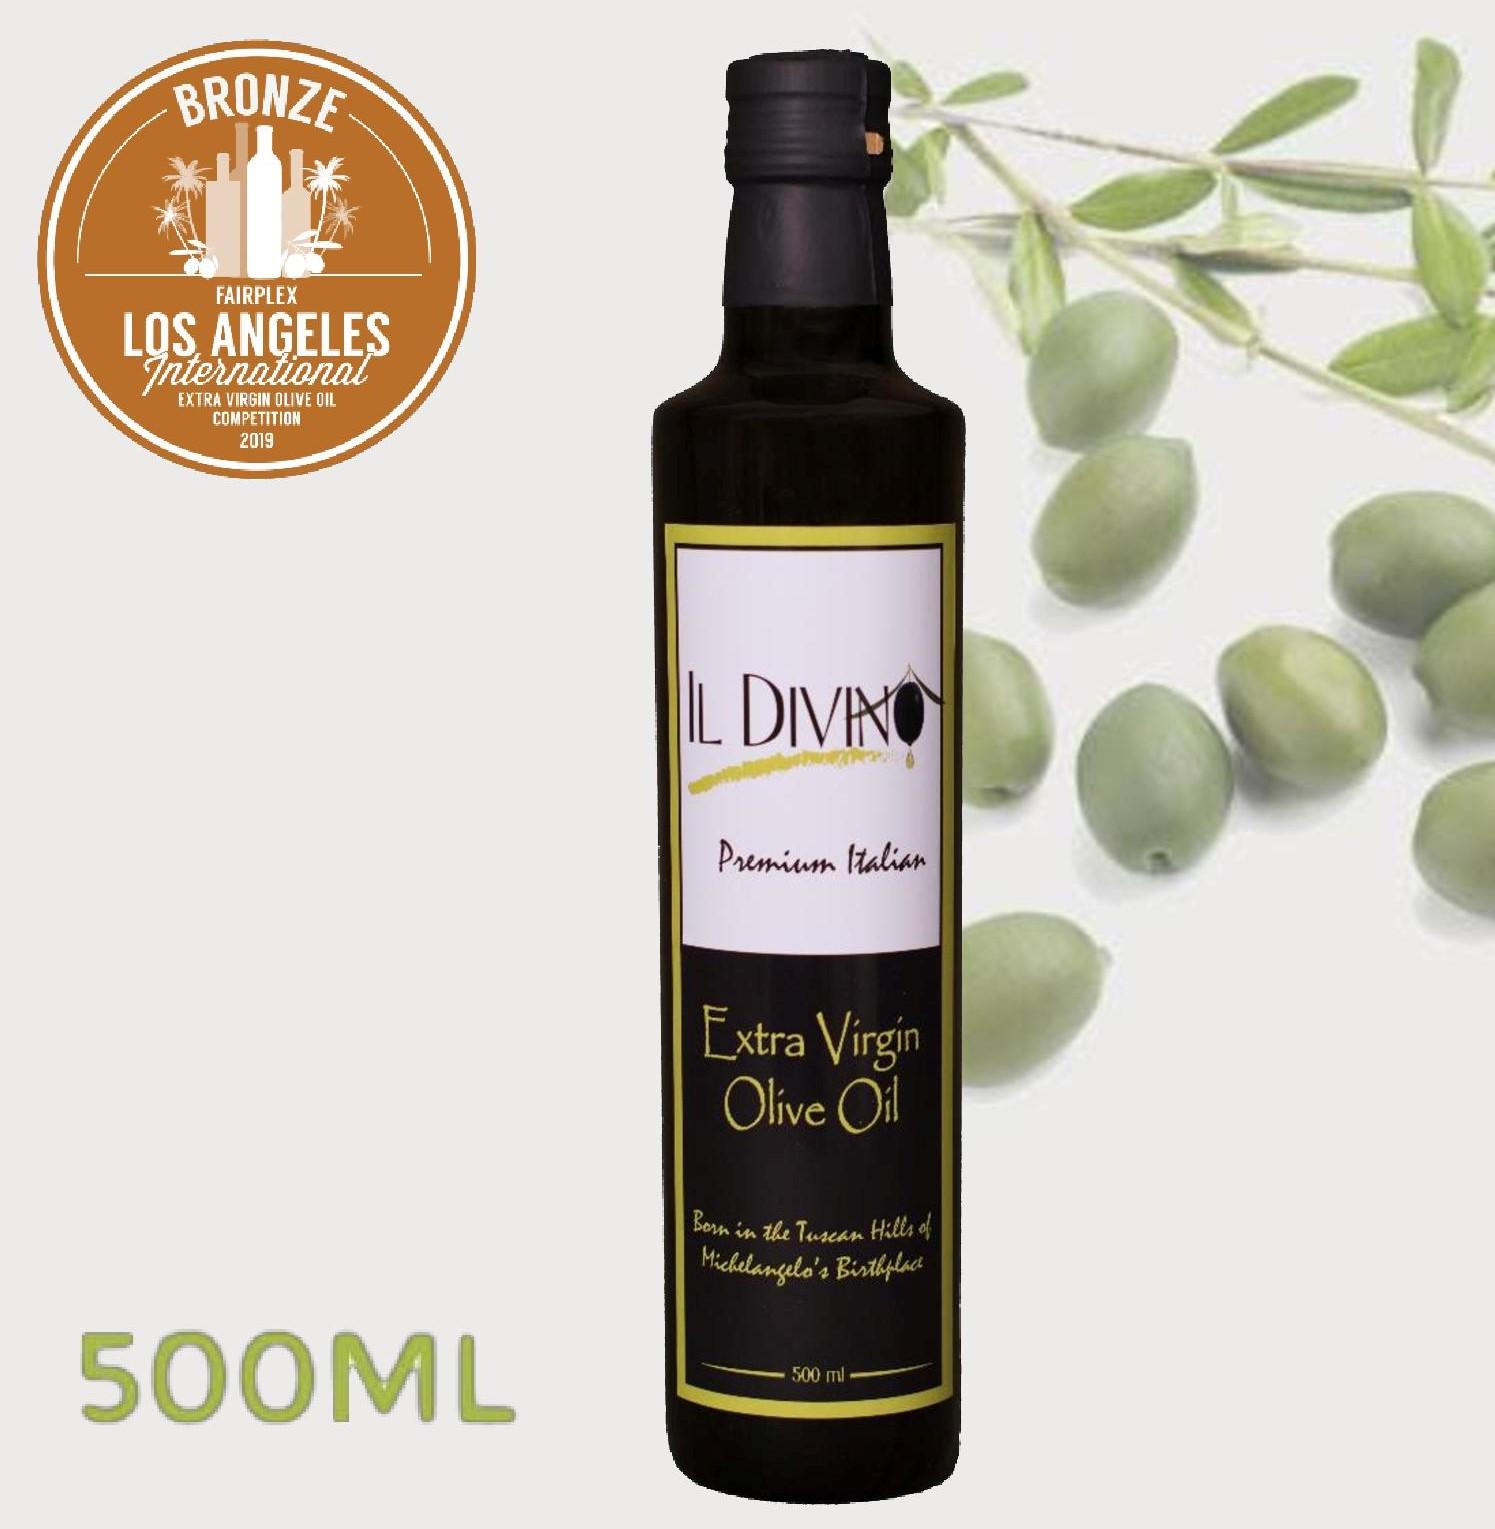 IL DIVINO Extra Virgin Olive Oil 500ml - 2019 (preorder)